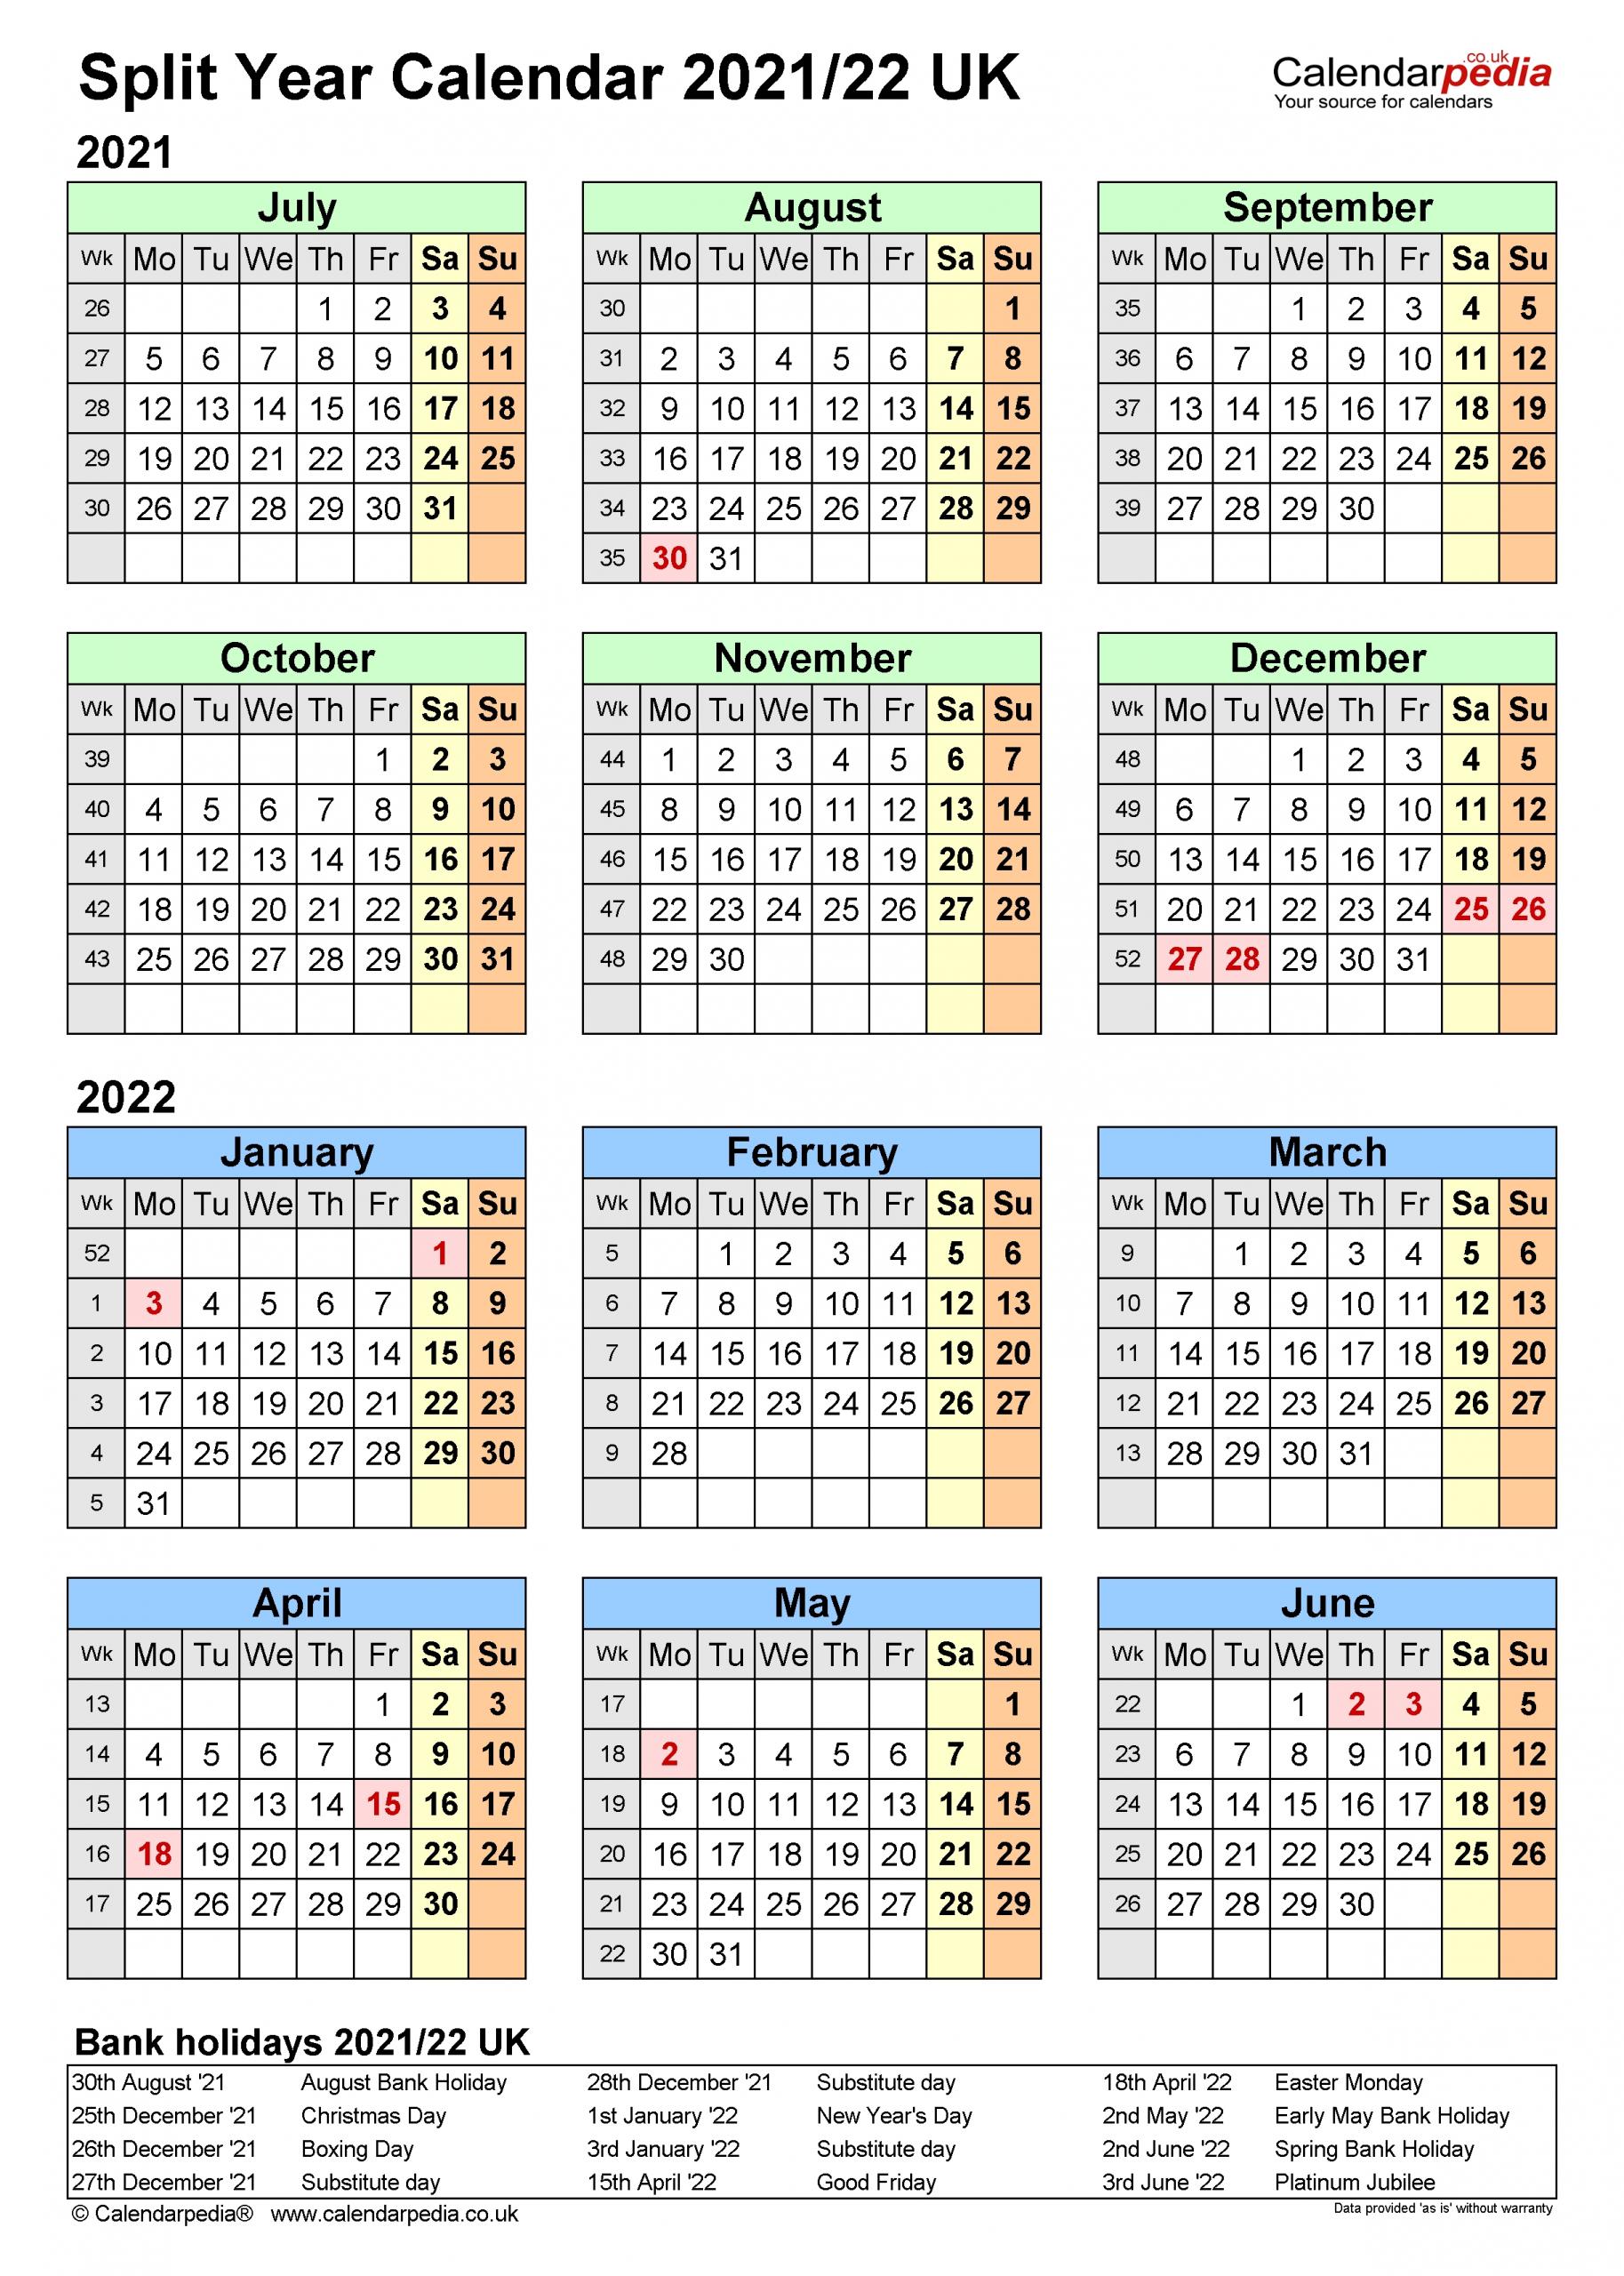 Split Year Calendar 2021 2022 | Printable March